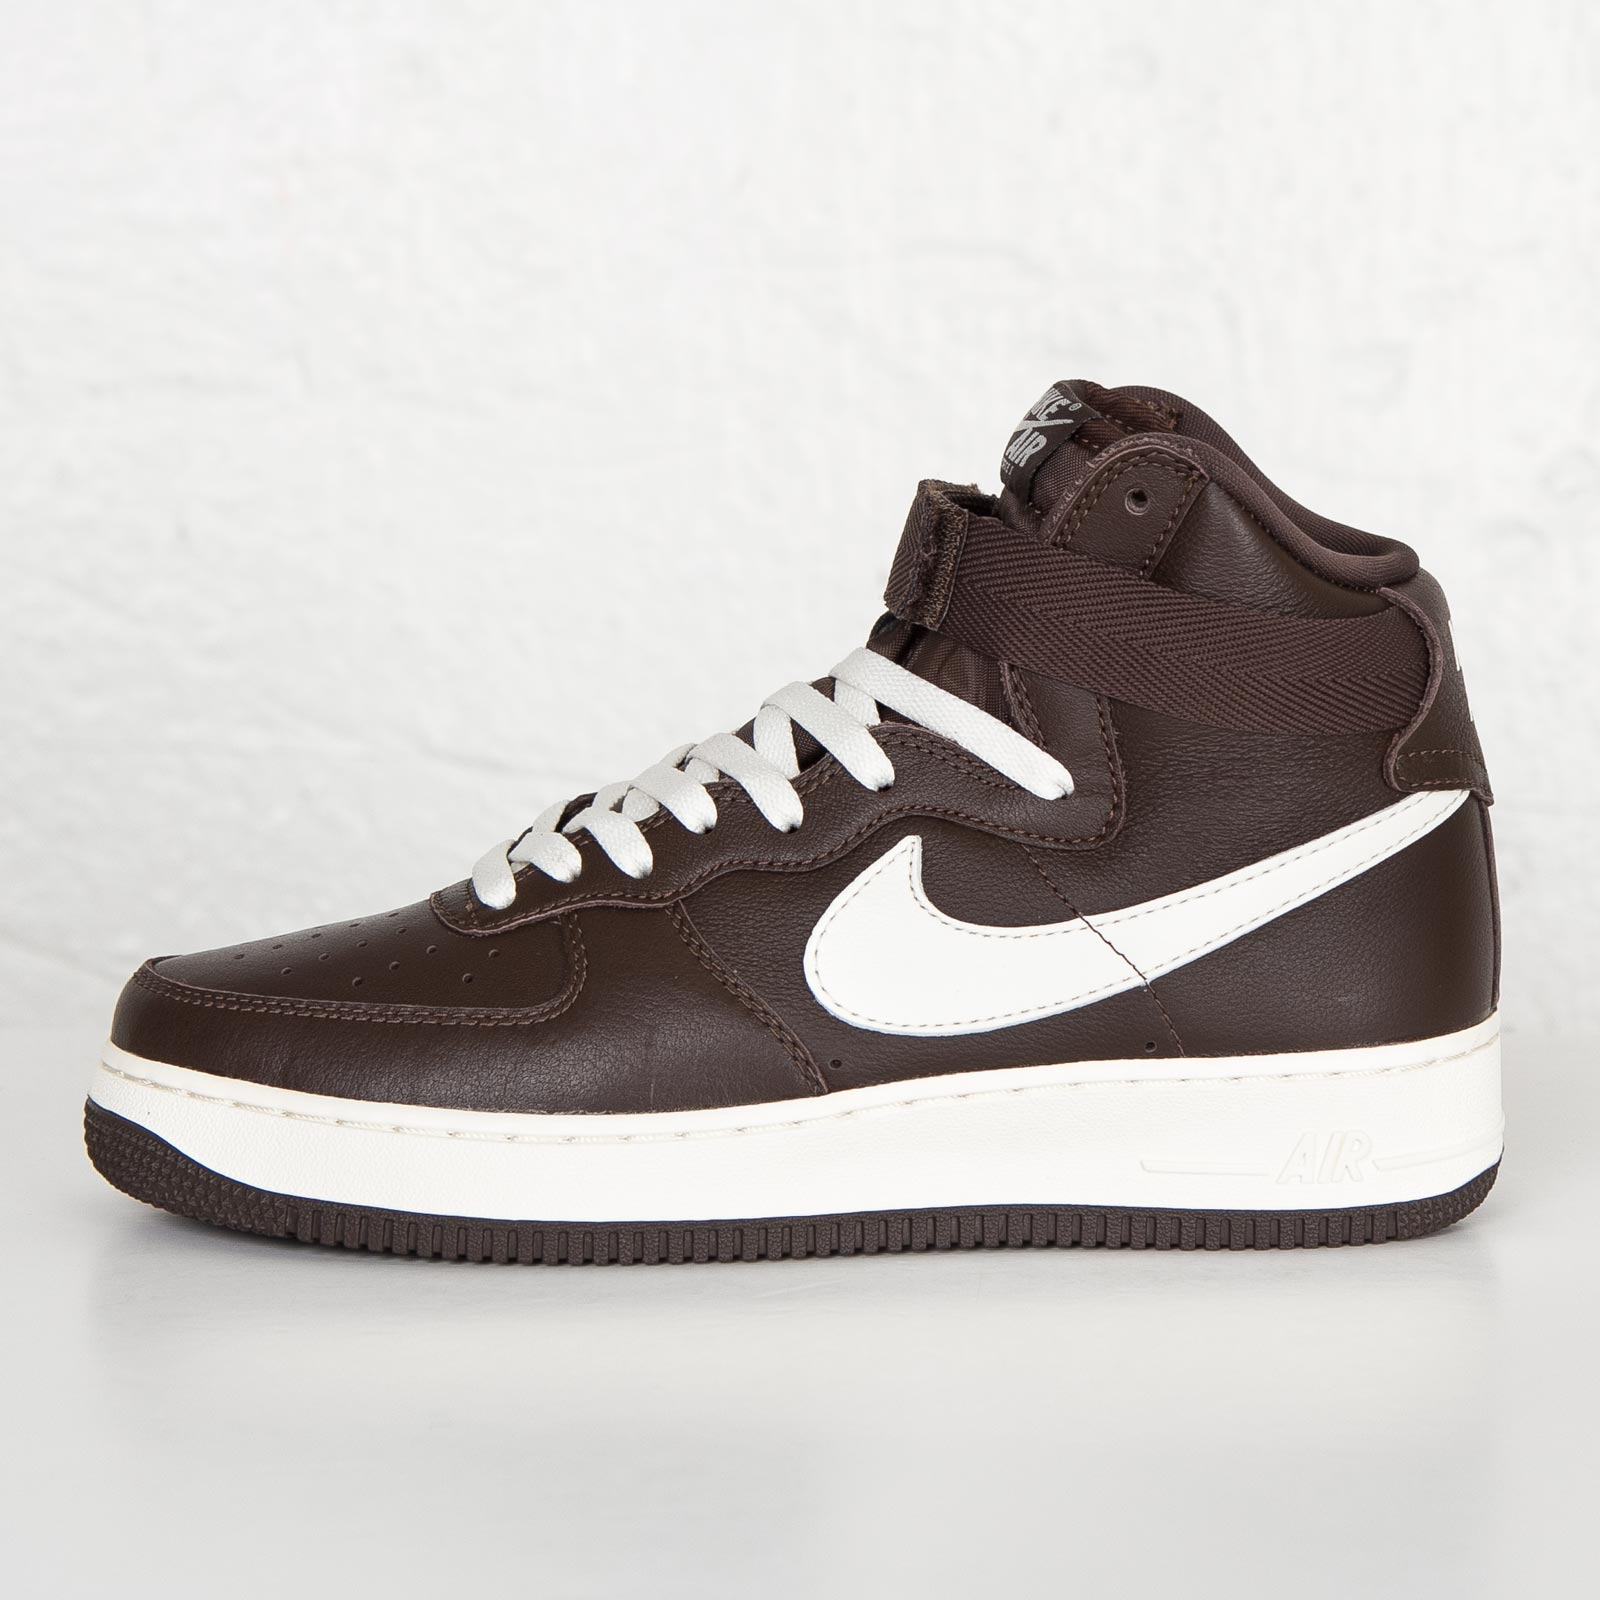 newest 6fa0c 35c58 ... Nike Air Force 1 Retro QS ...